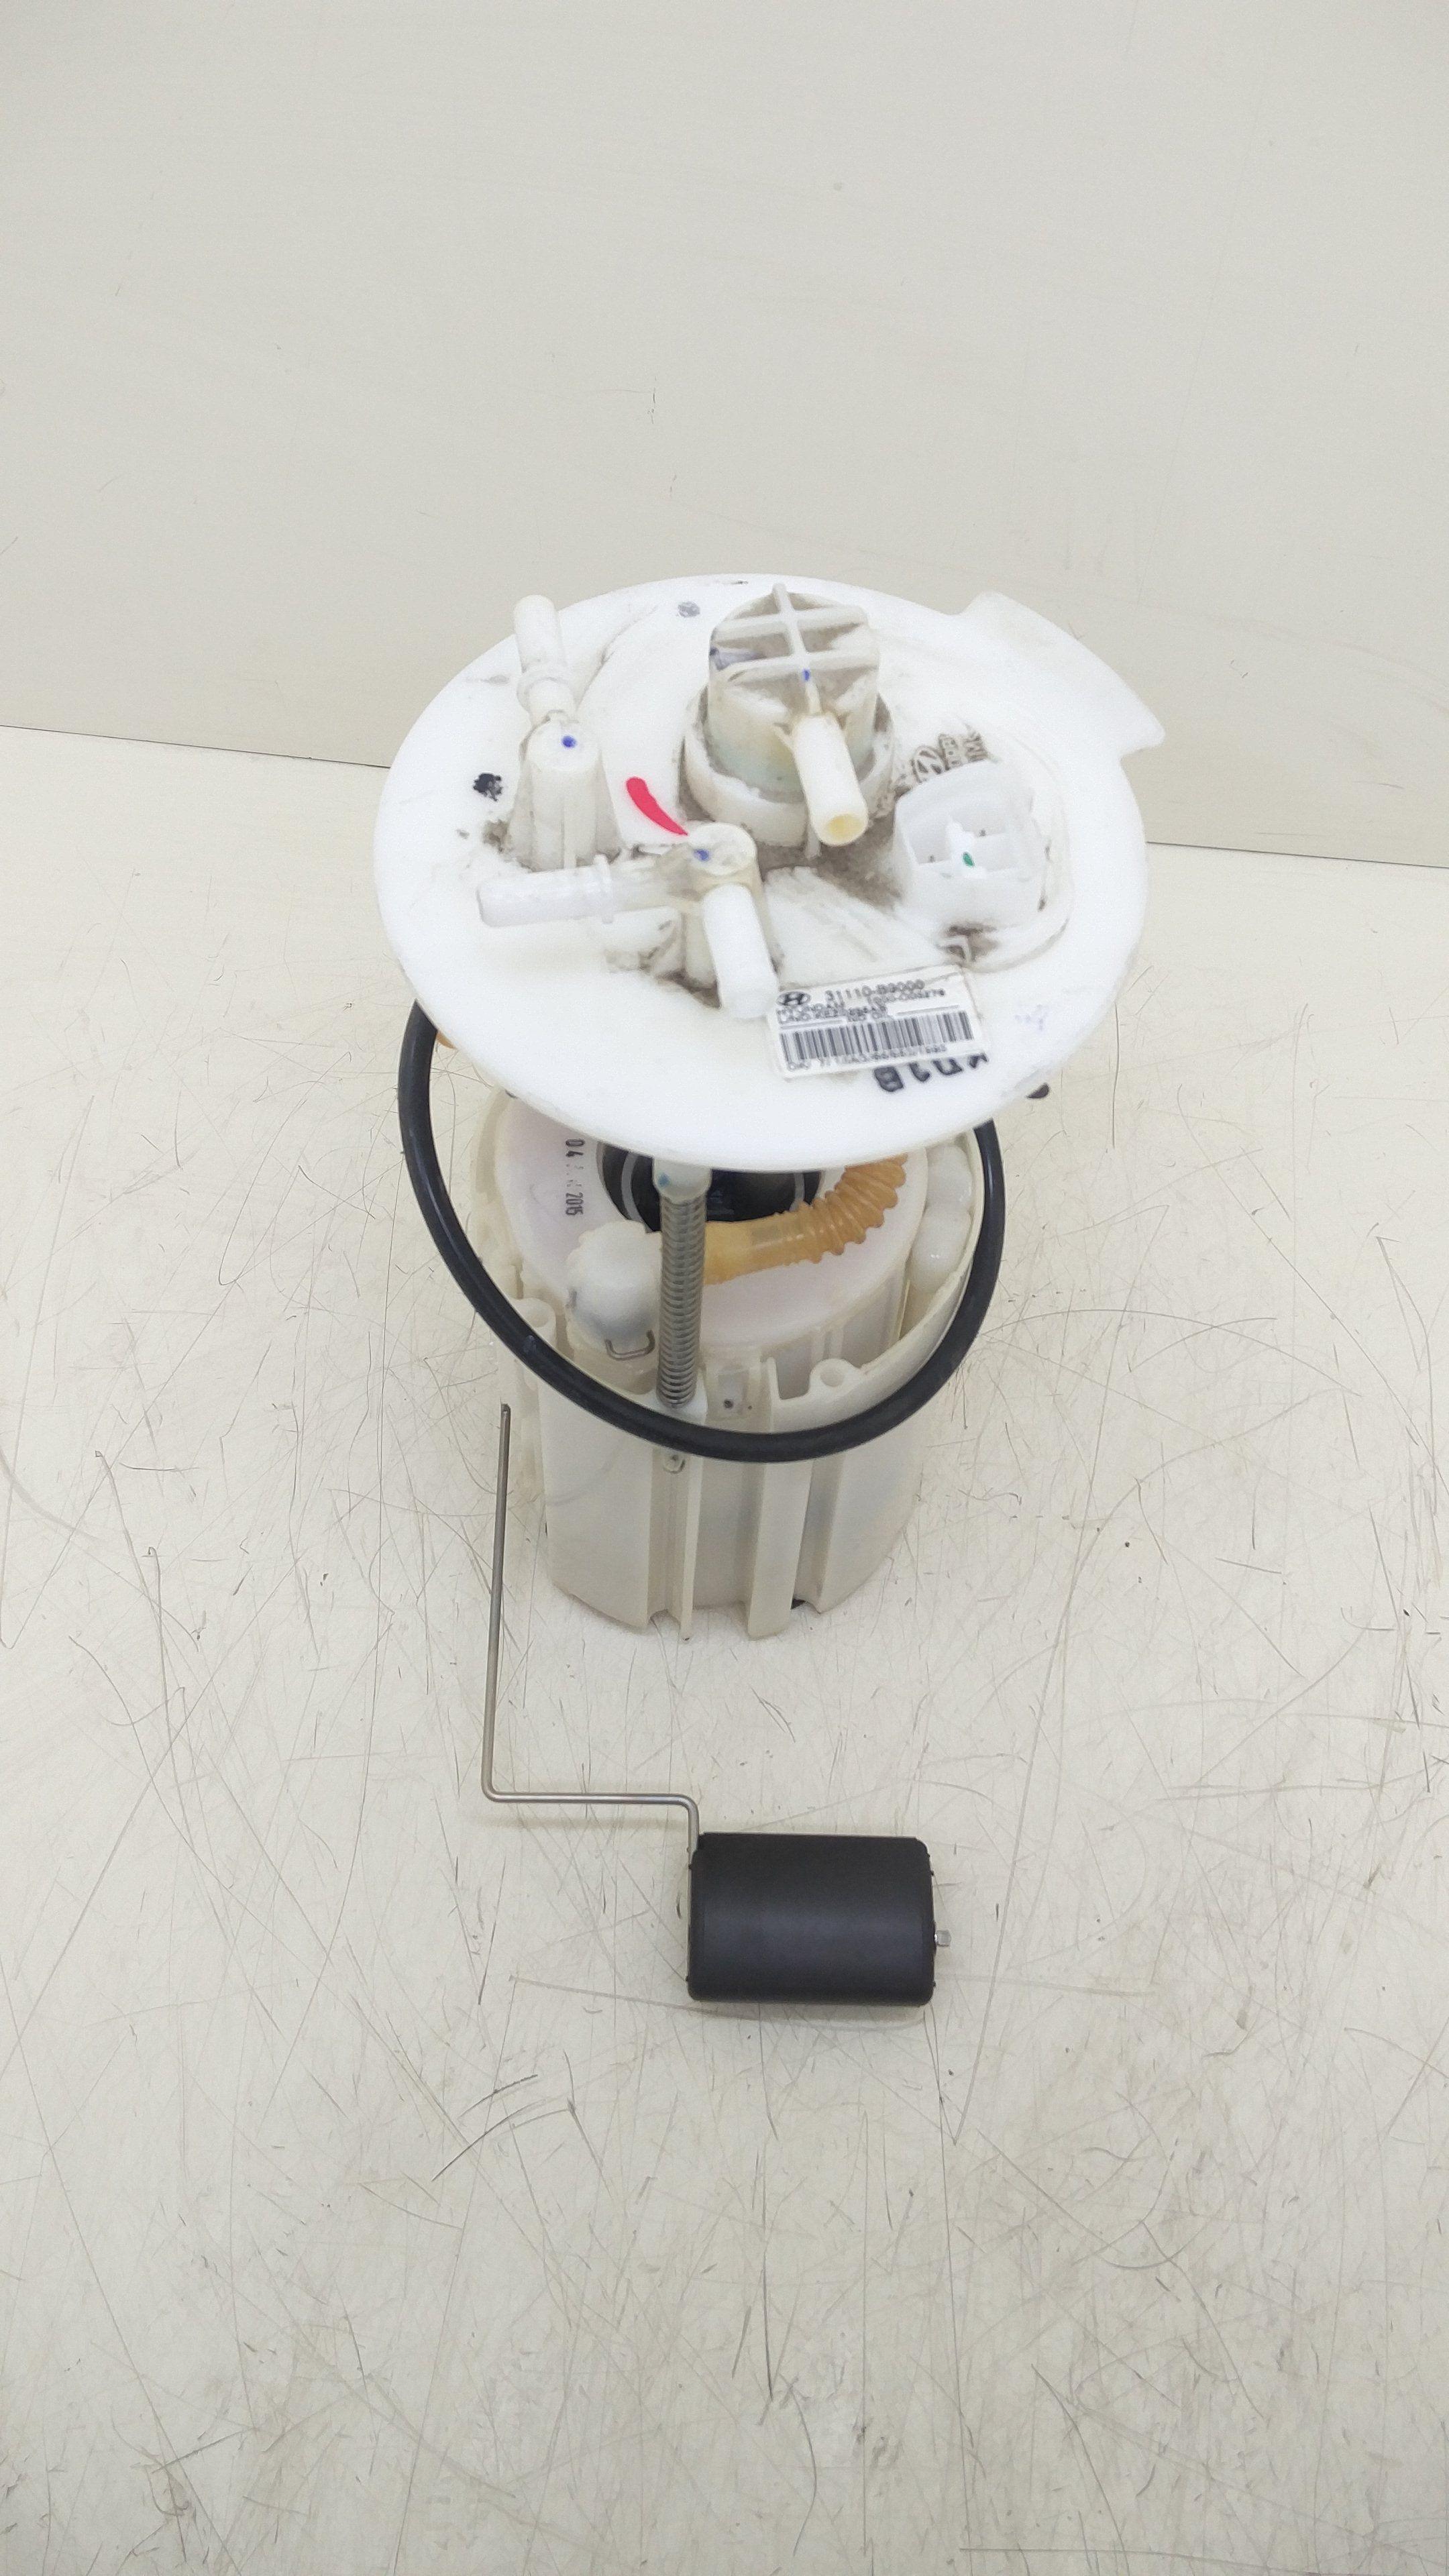 31110b9000 POMPA CARBURANTE HYUNDAI i10 2° Serie 1000 Benzina  (2011) RICAMBI USATI